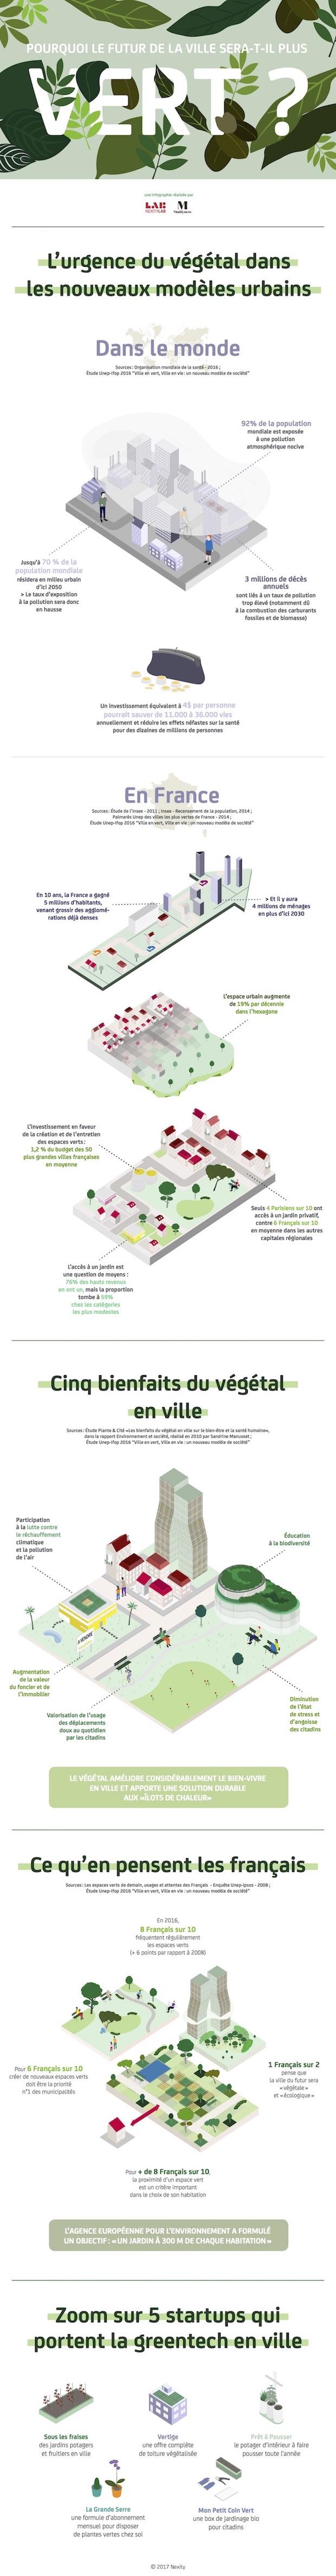 Infographie Ville verte